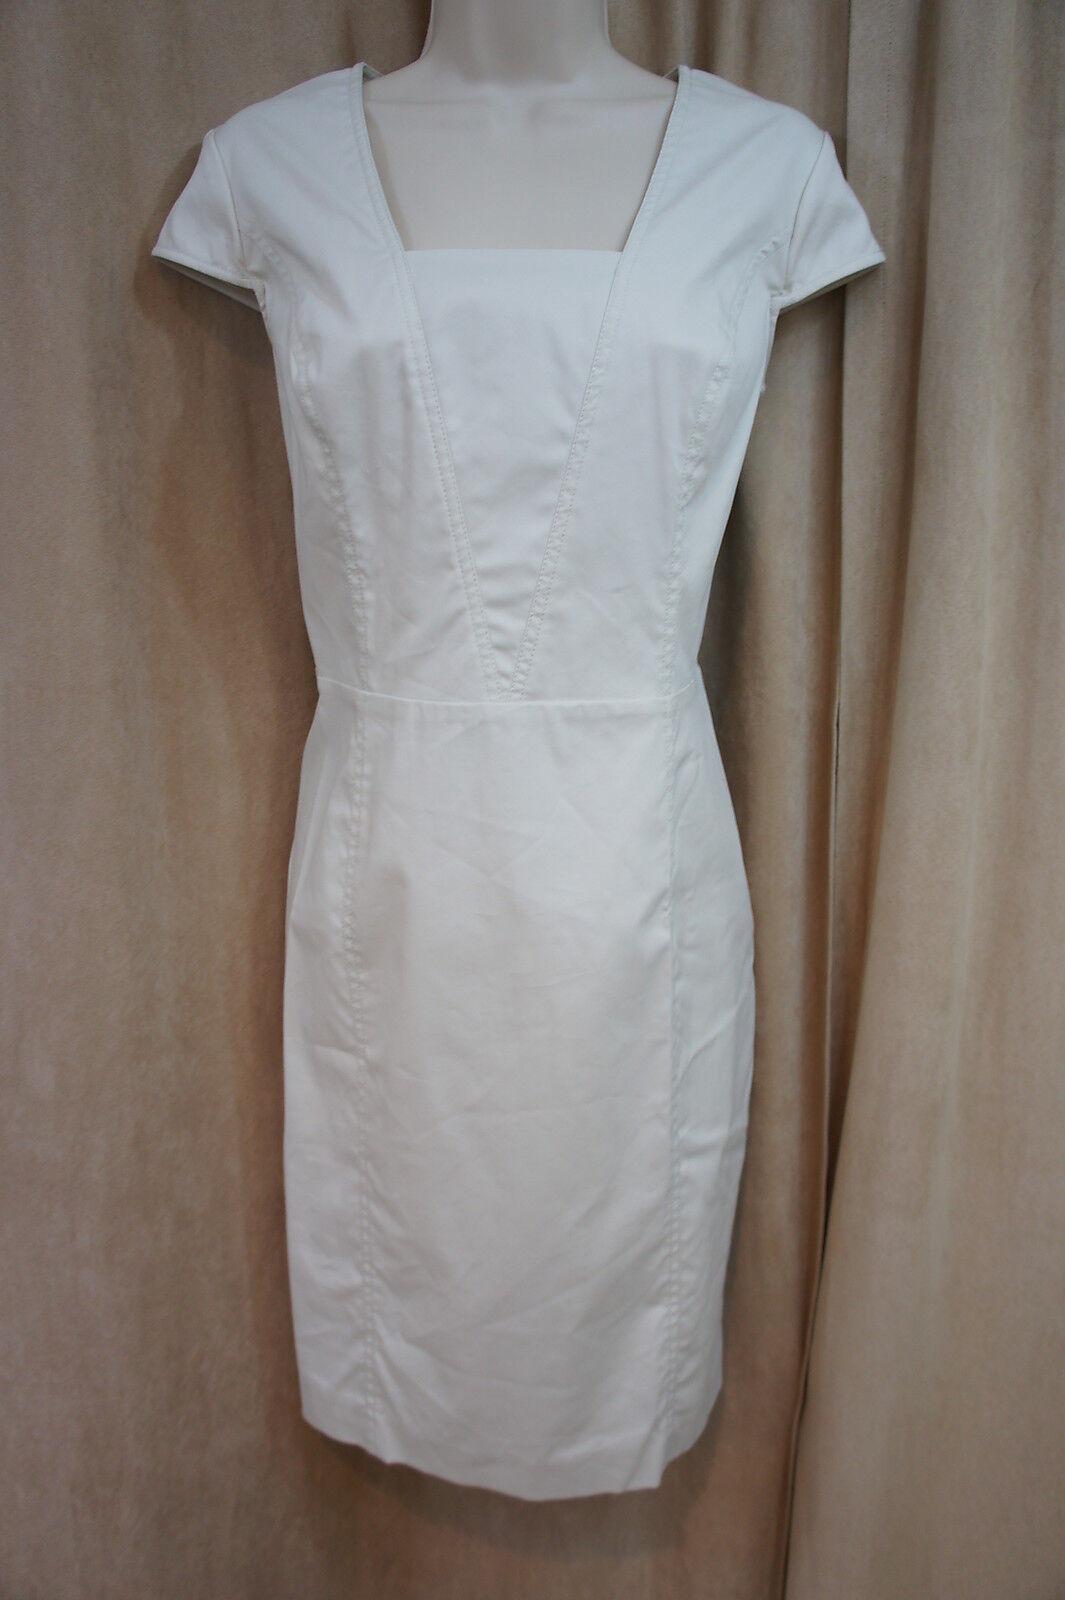 Marc New York Andrew Marc Dress Sz 8 Nimbus Beige Cap Sleeve Business Dress